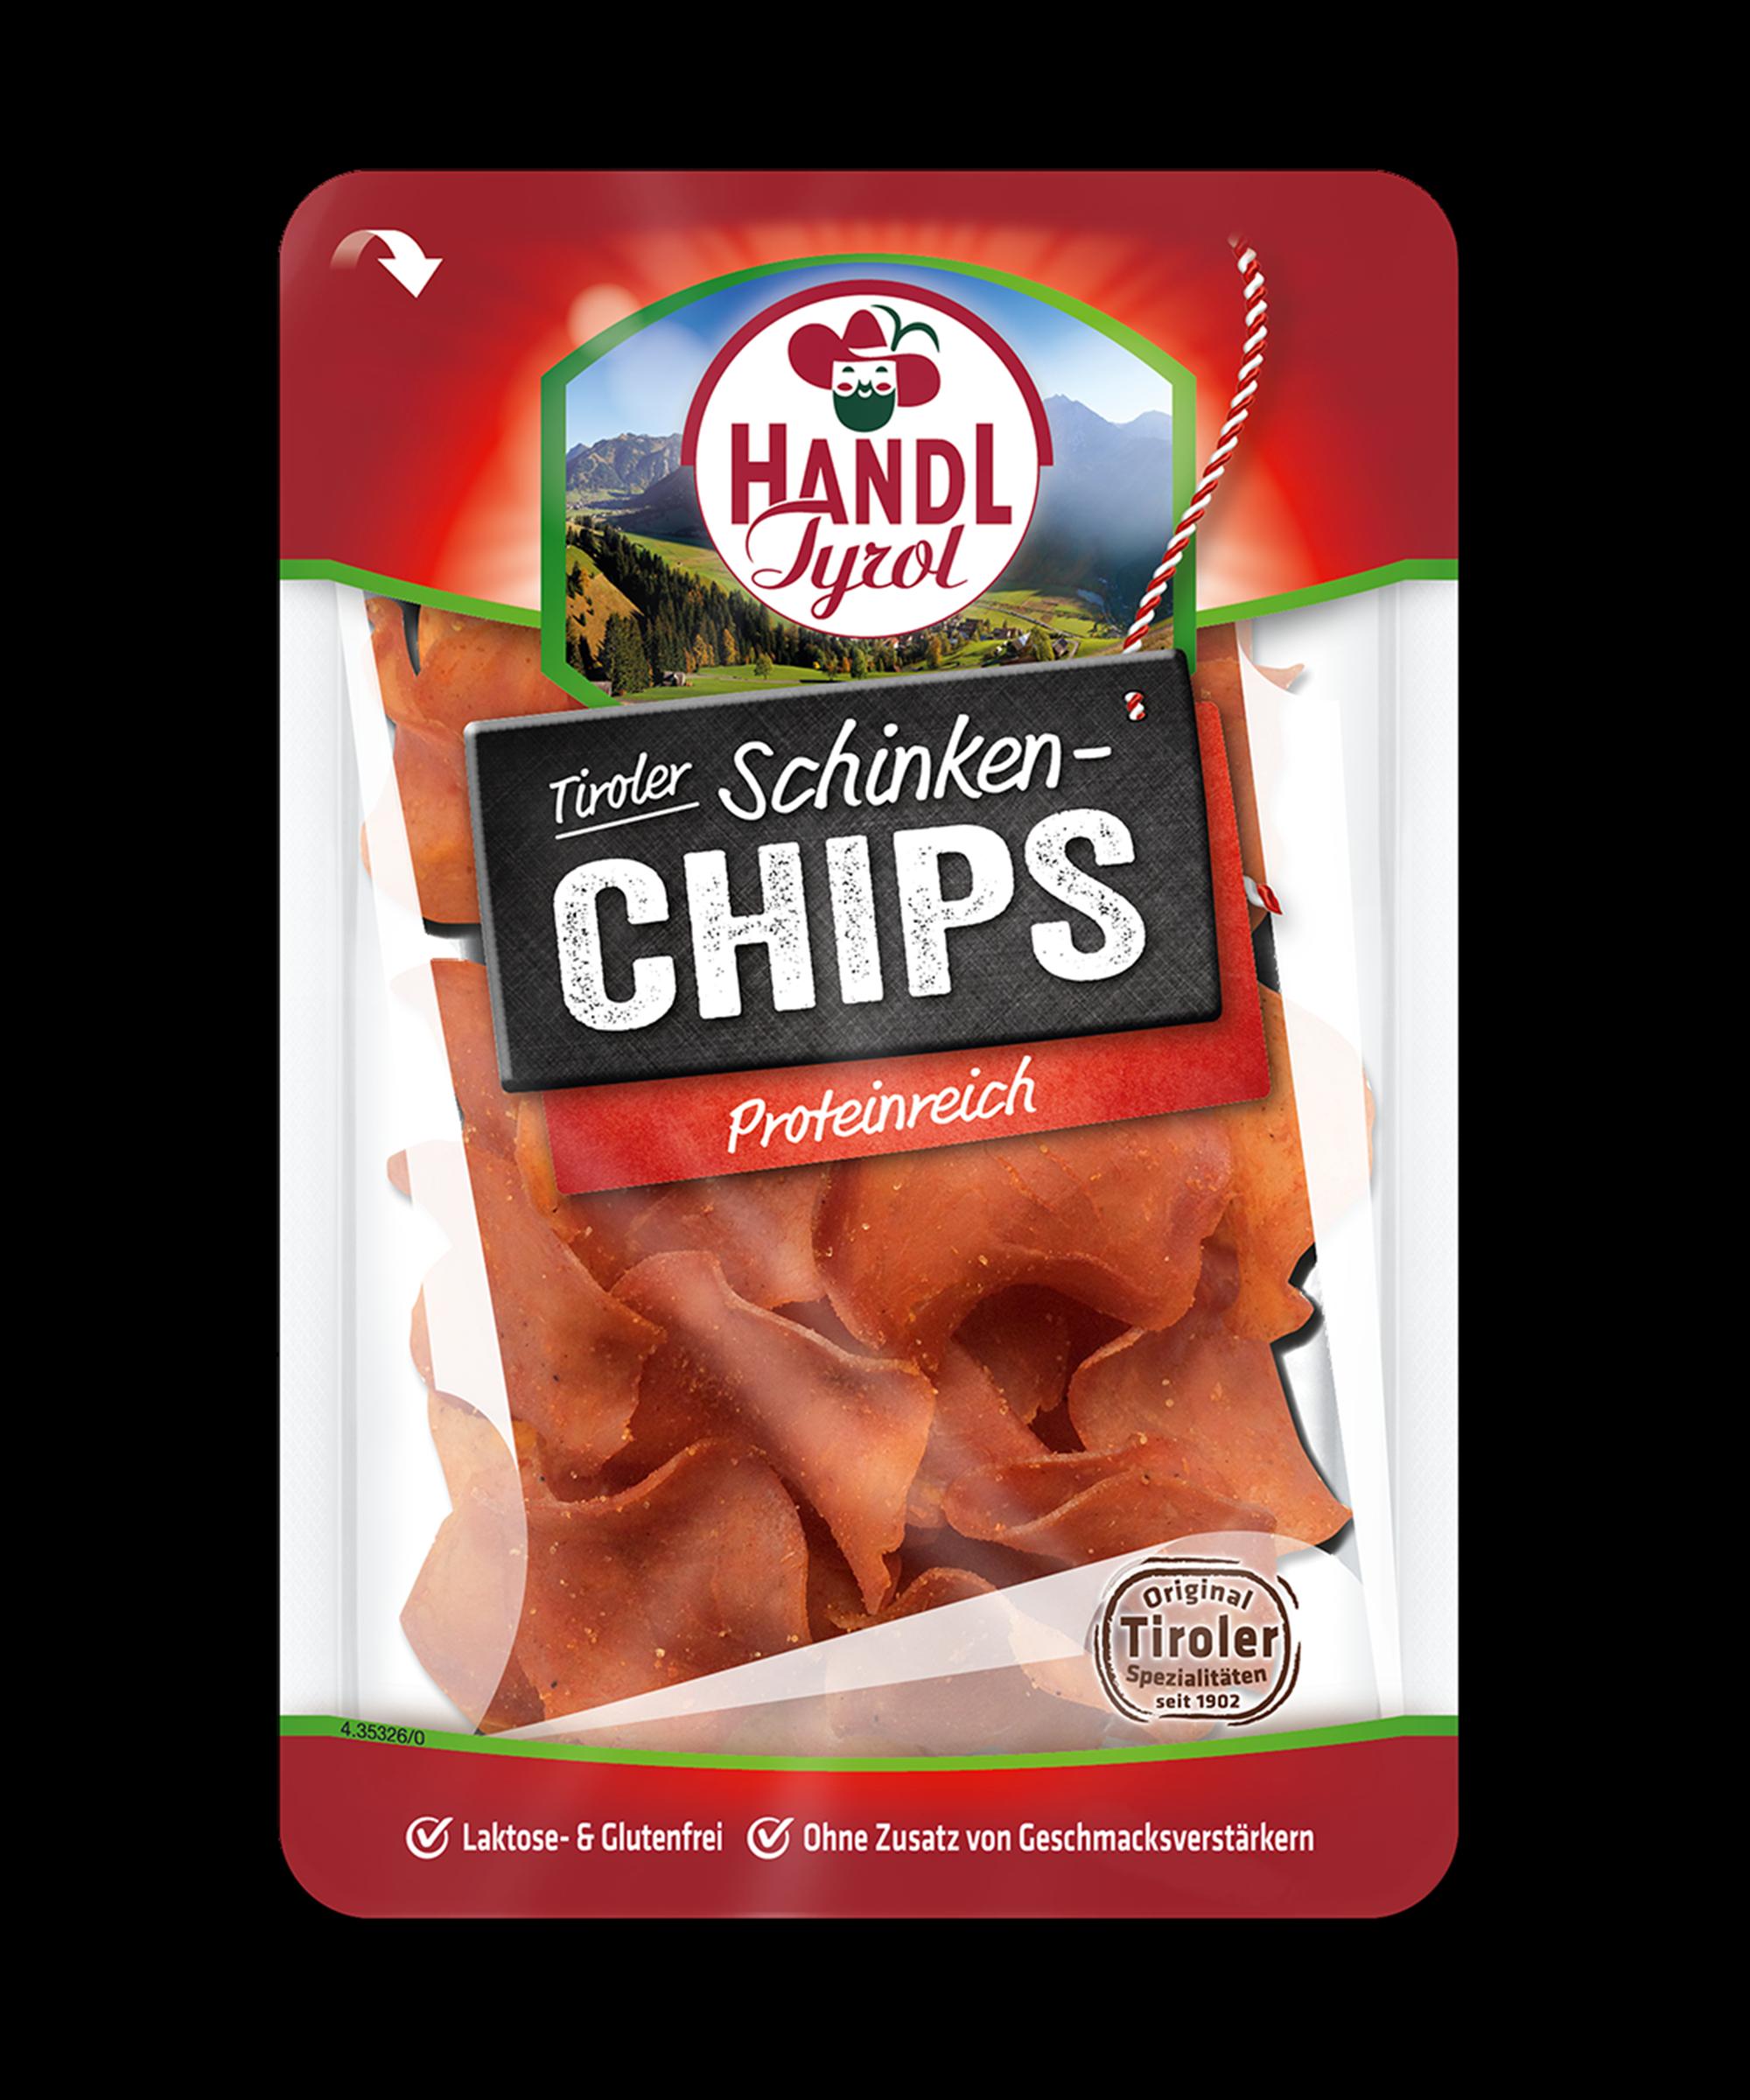 Ham clipart protein. Tyrolean chips handl tyrol